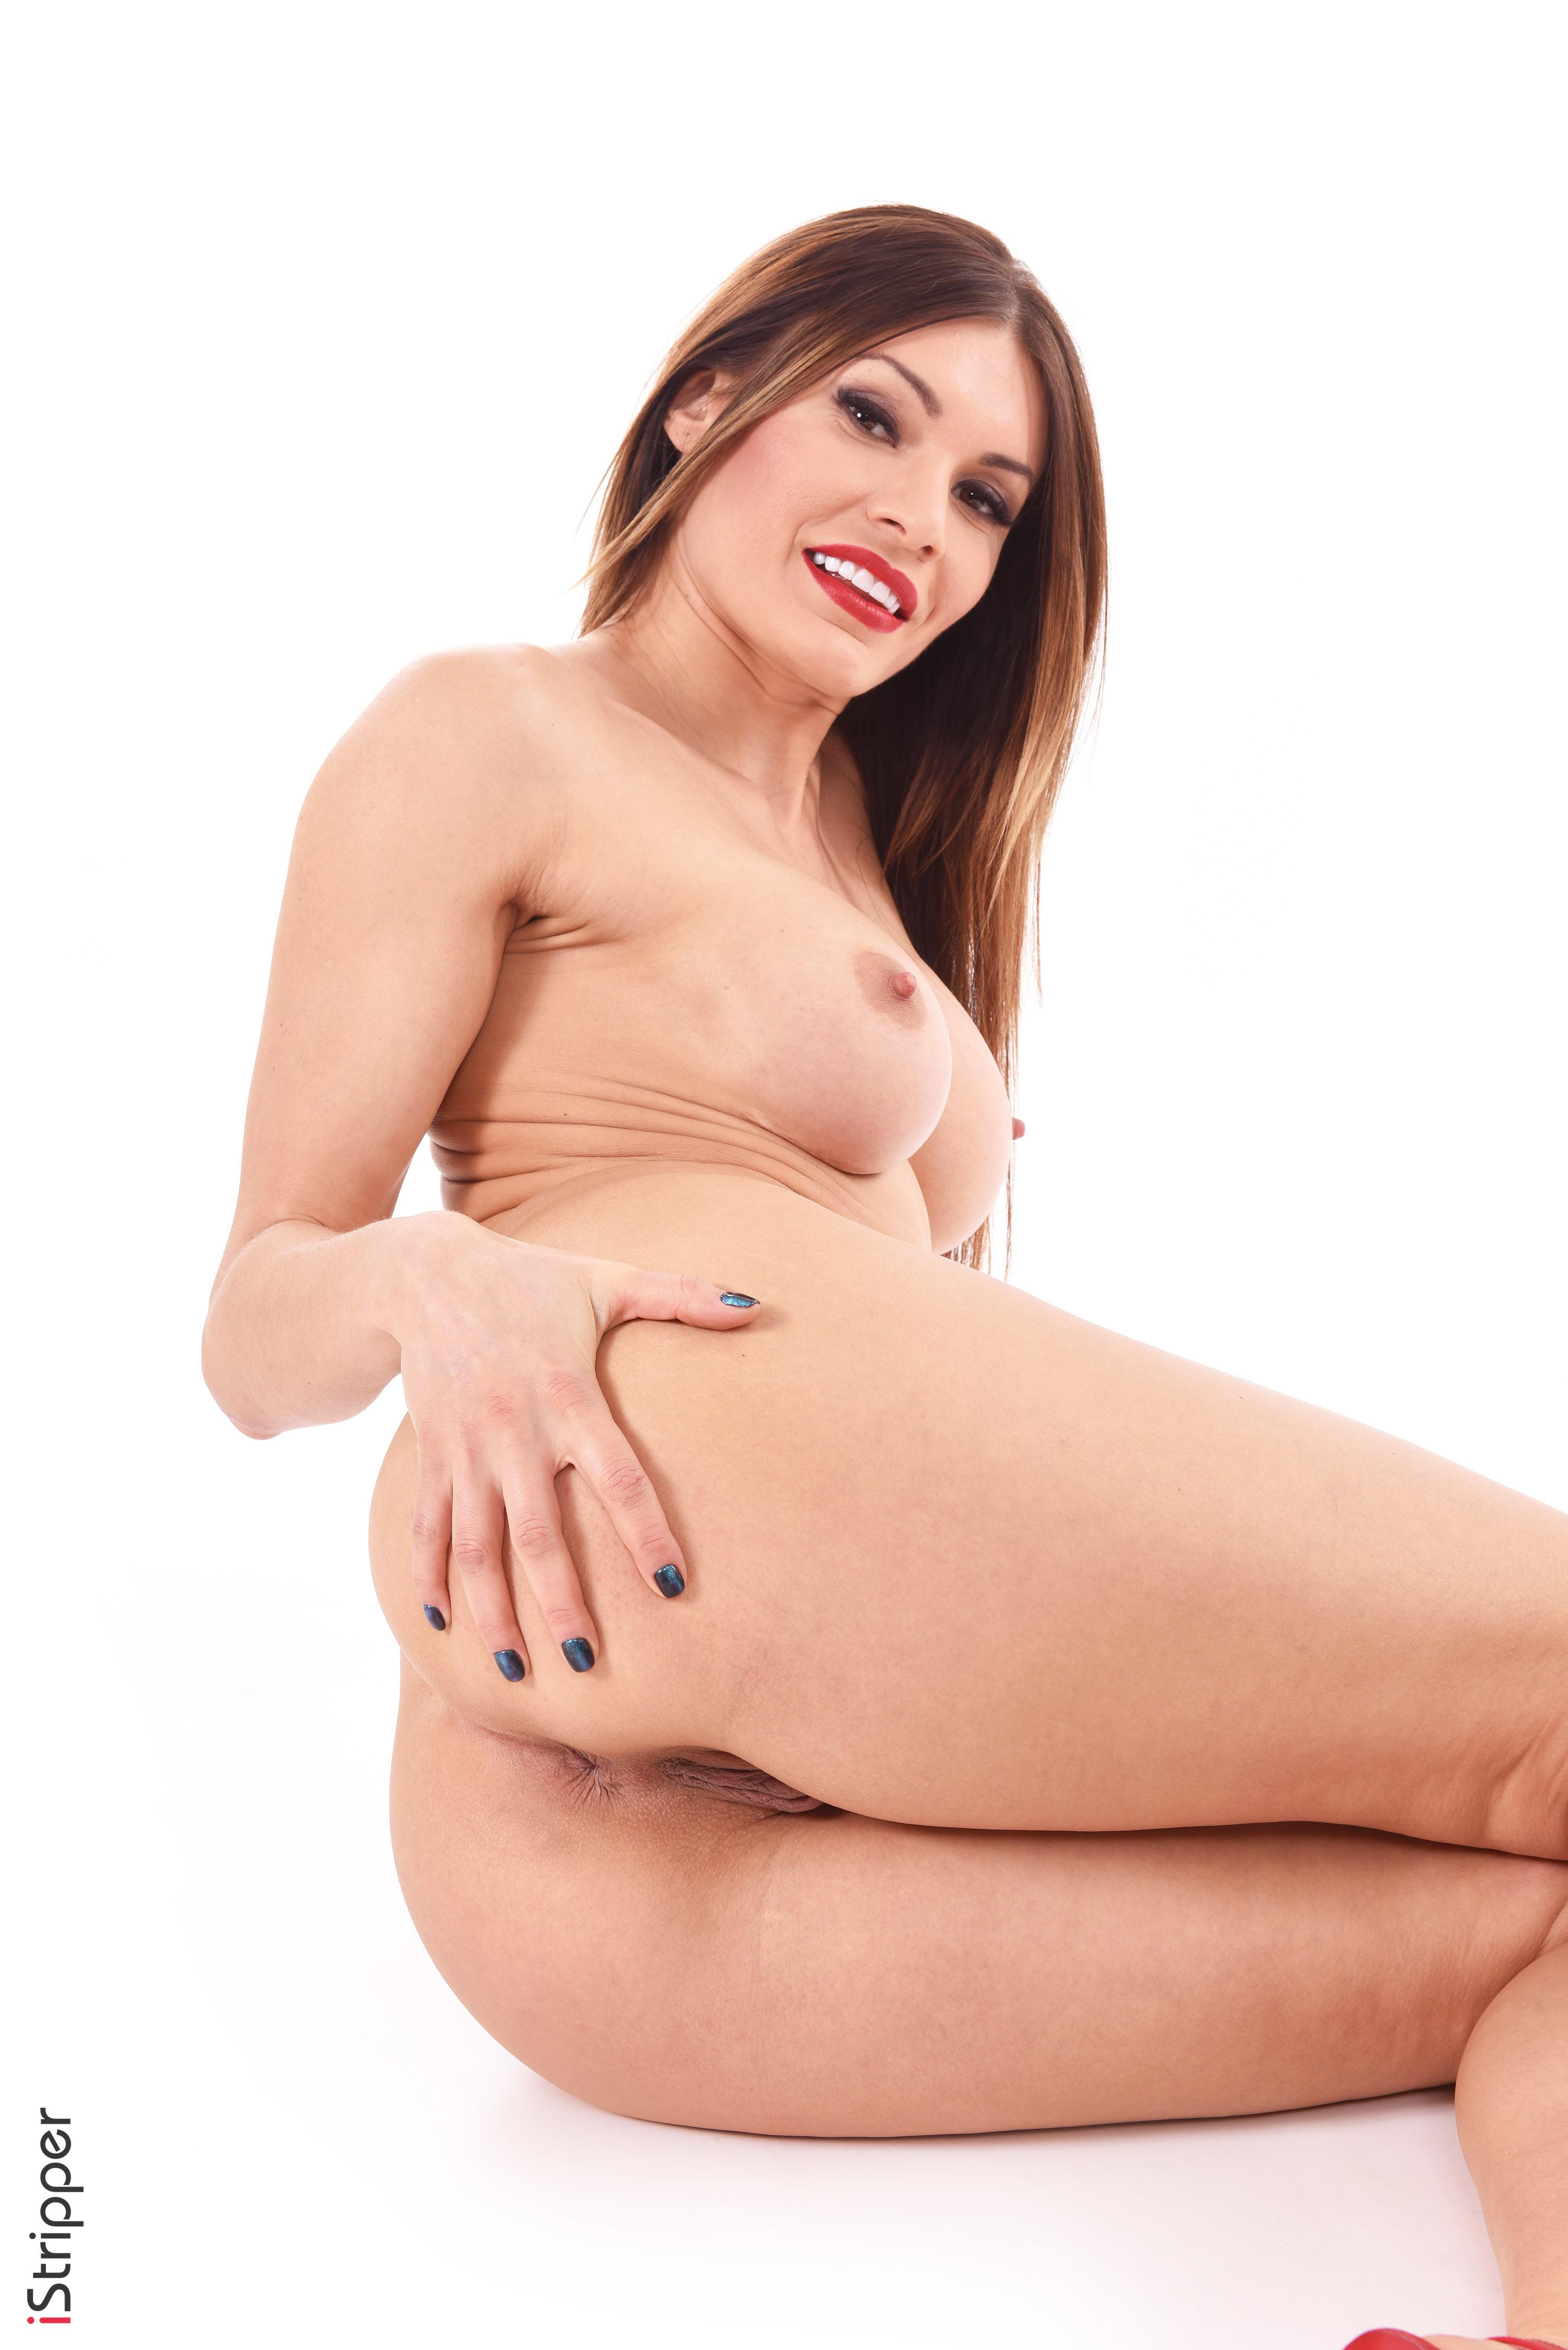 the vagina up close